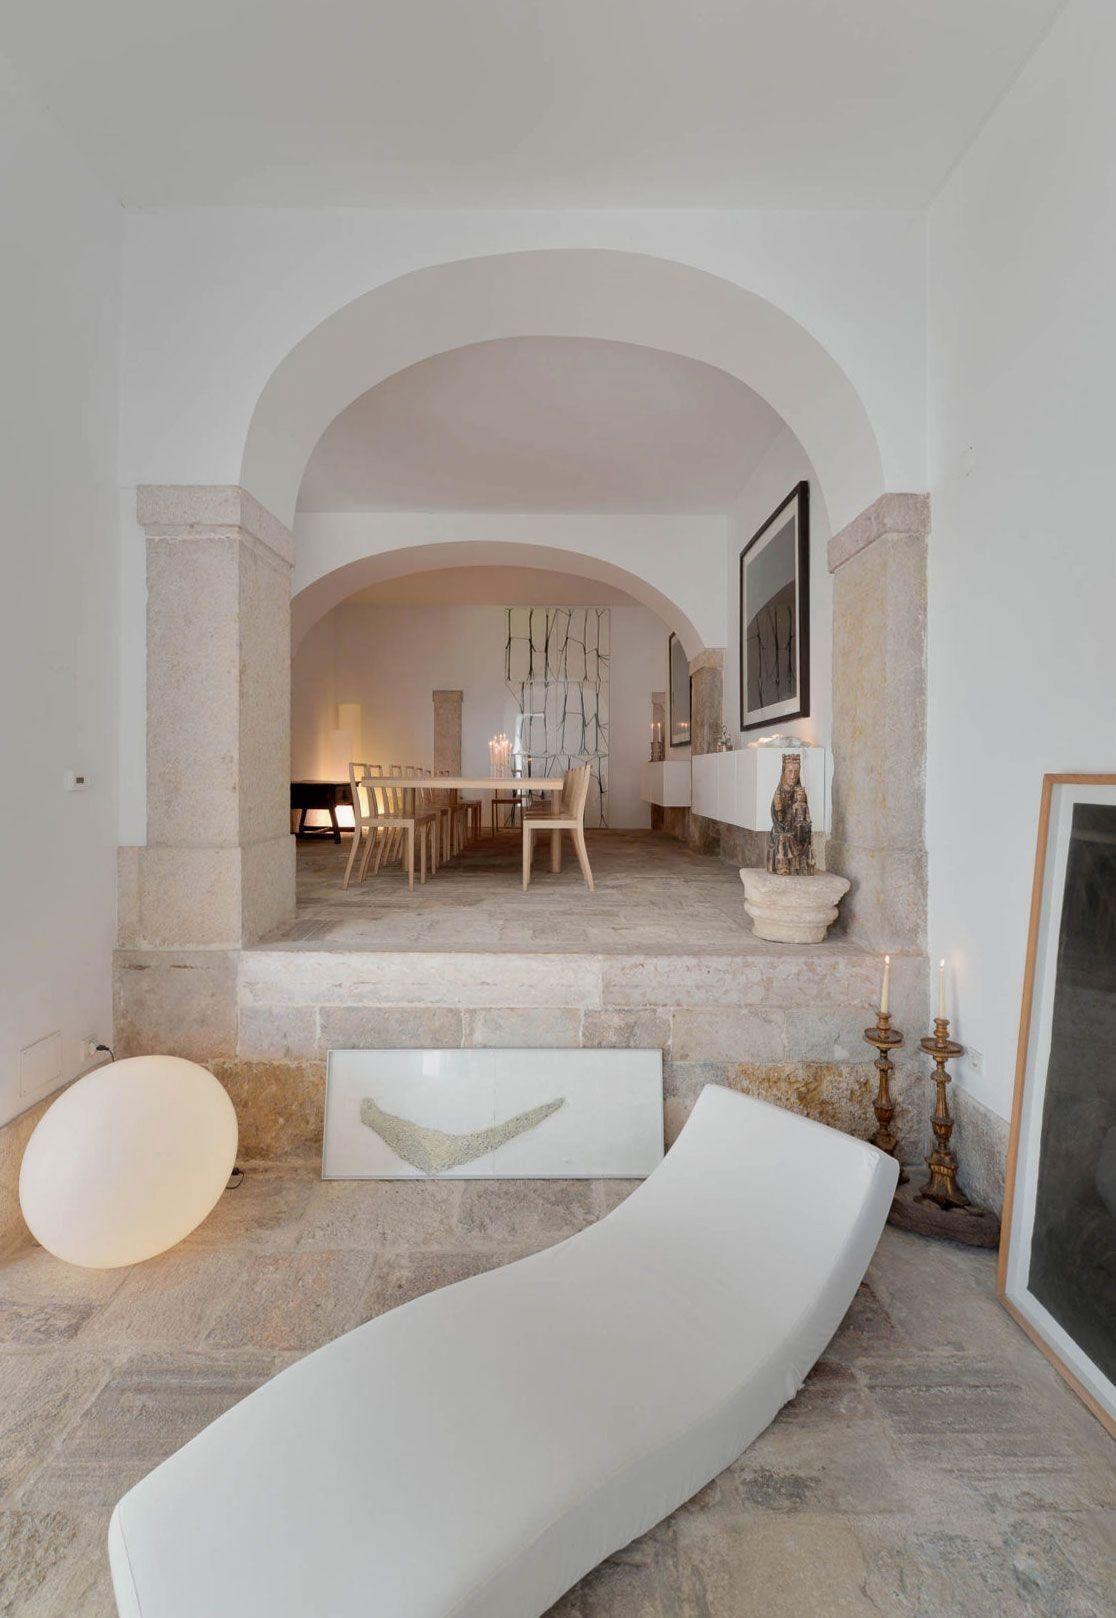 Best Interior Design Websites Image By Claybournejkna8iw On